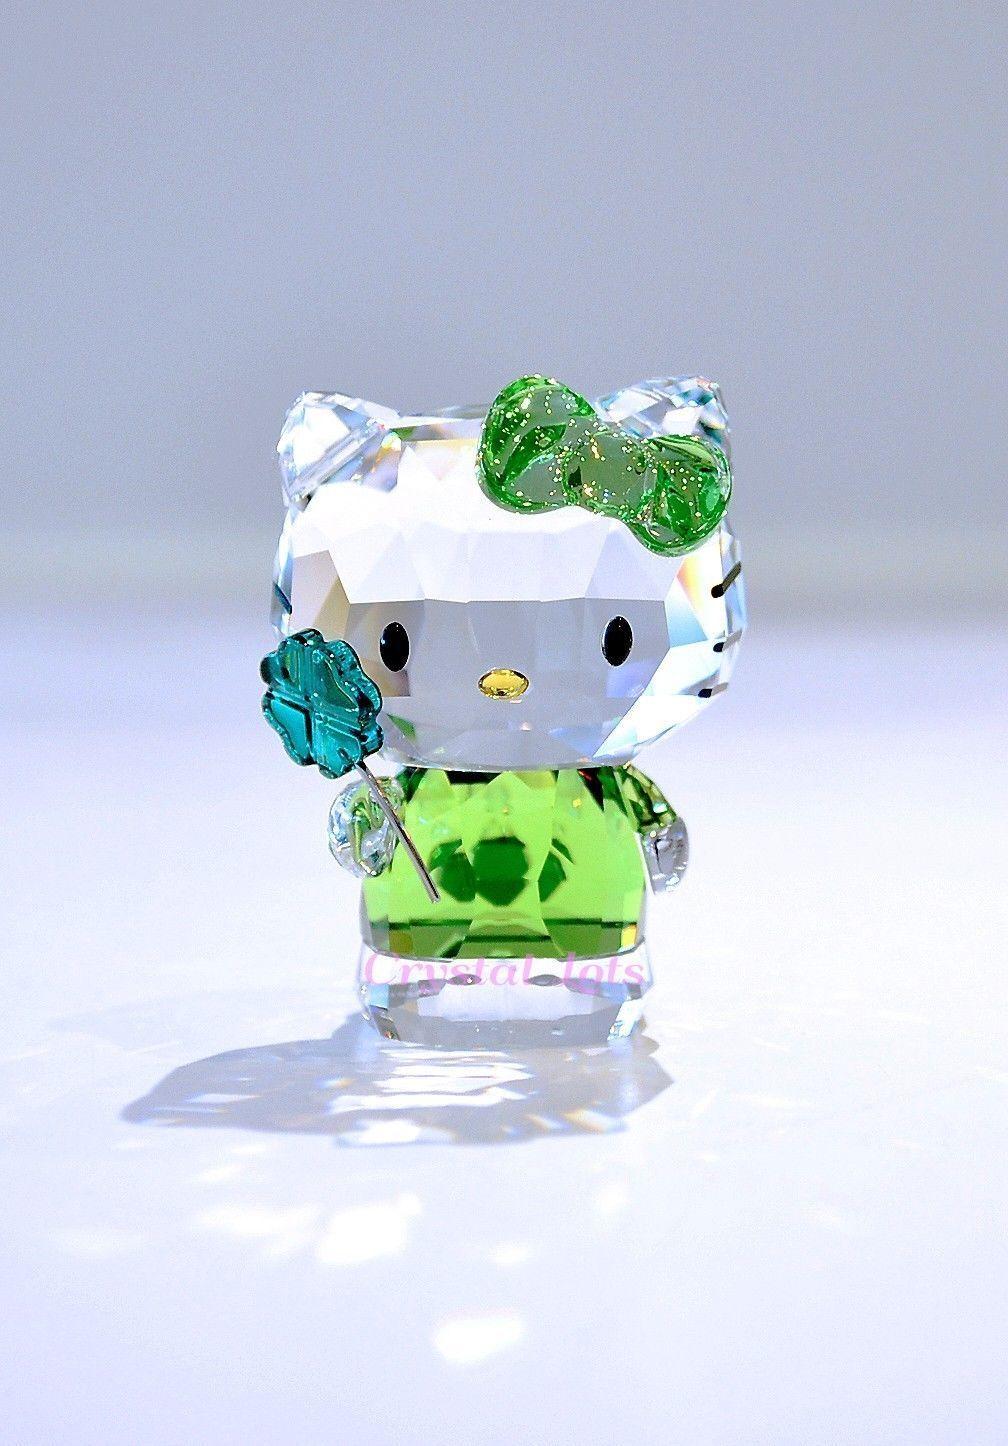 d722aaff22 Swarovski Hello Kitty Lucky Charm - 5004741 for sale online | eBay